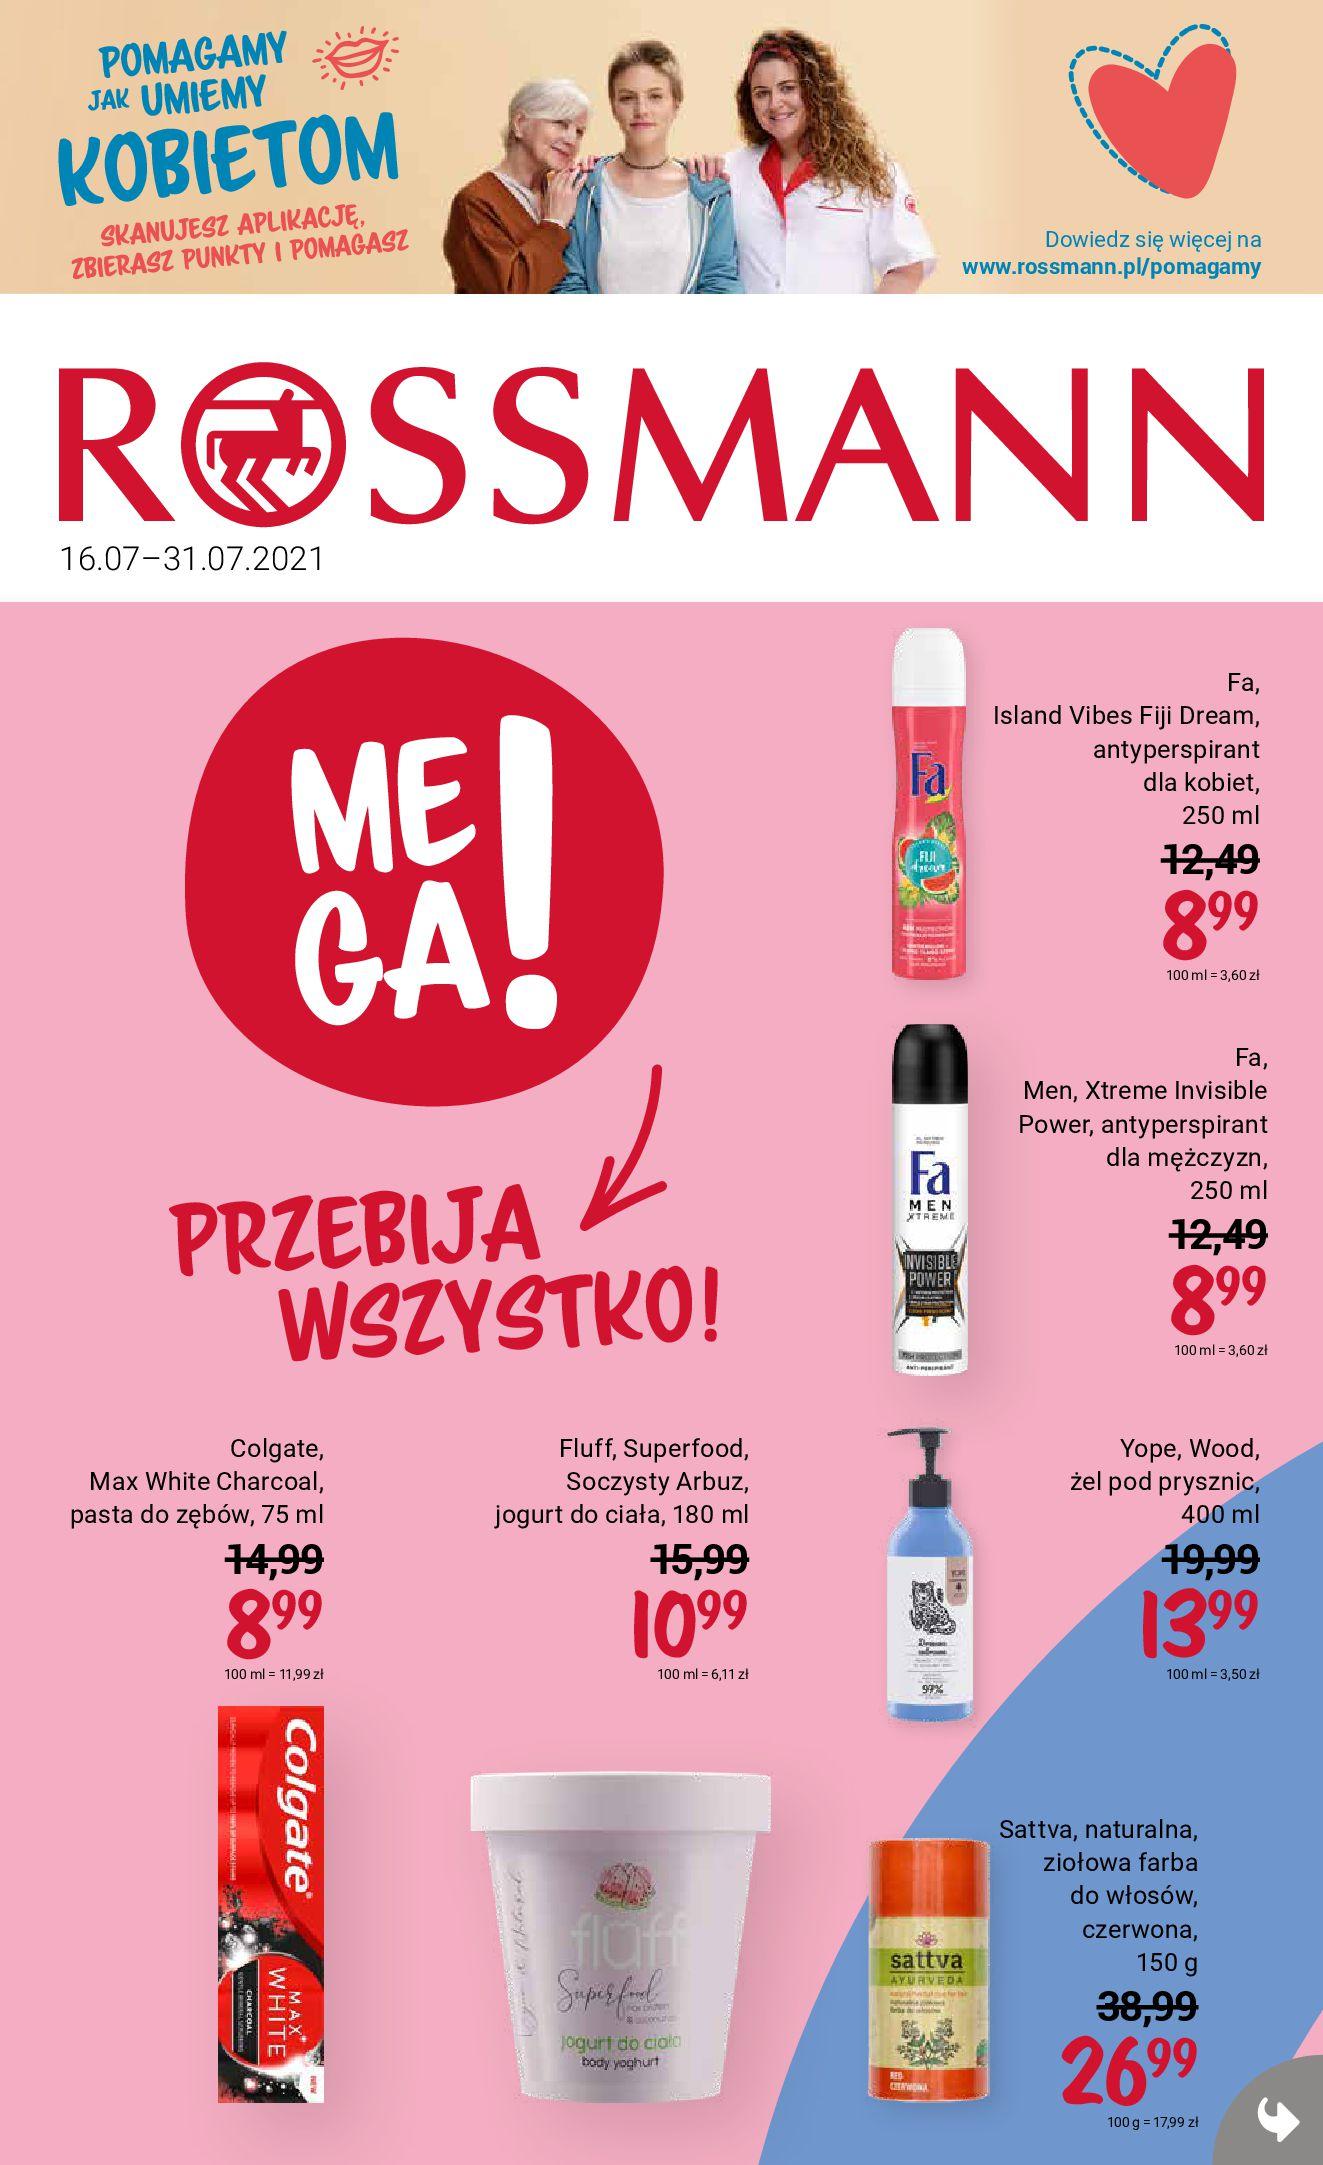 Rossmann:  Gazetka Rossmann od 16.07 15.07.2021